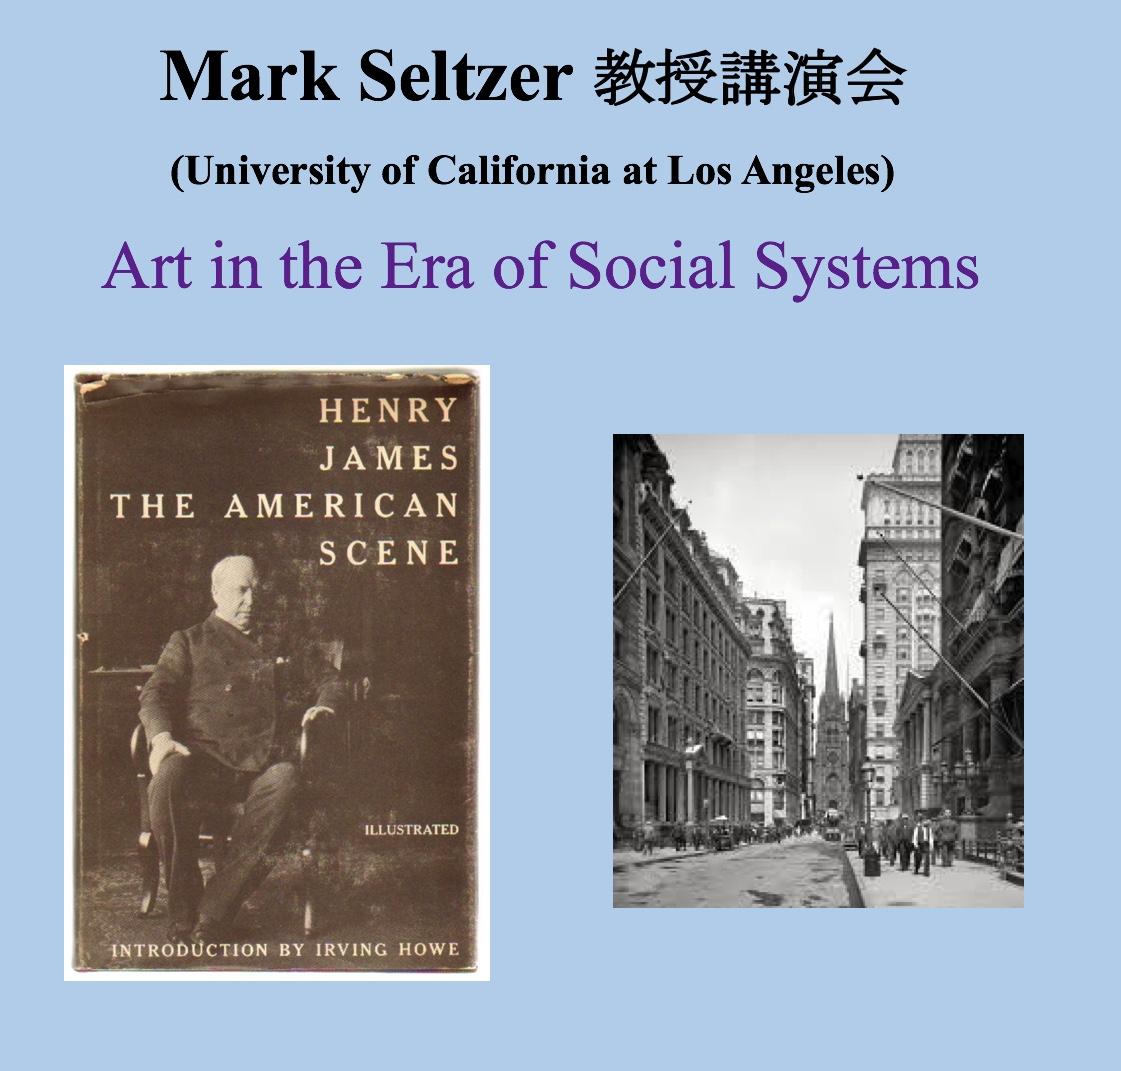 Mark Seltzer教授 (University of California at Los Angeles) 講演会